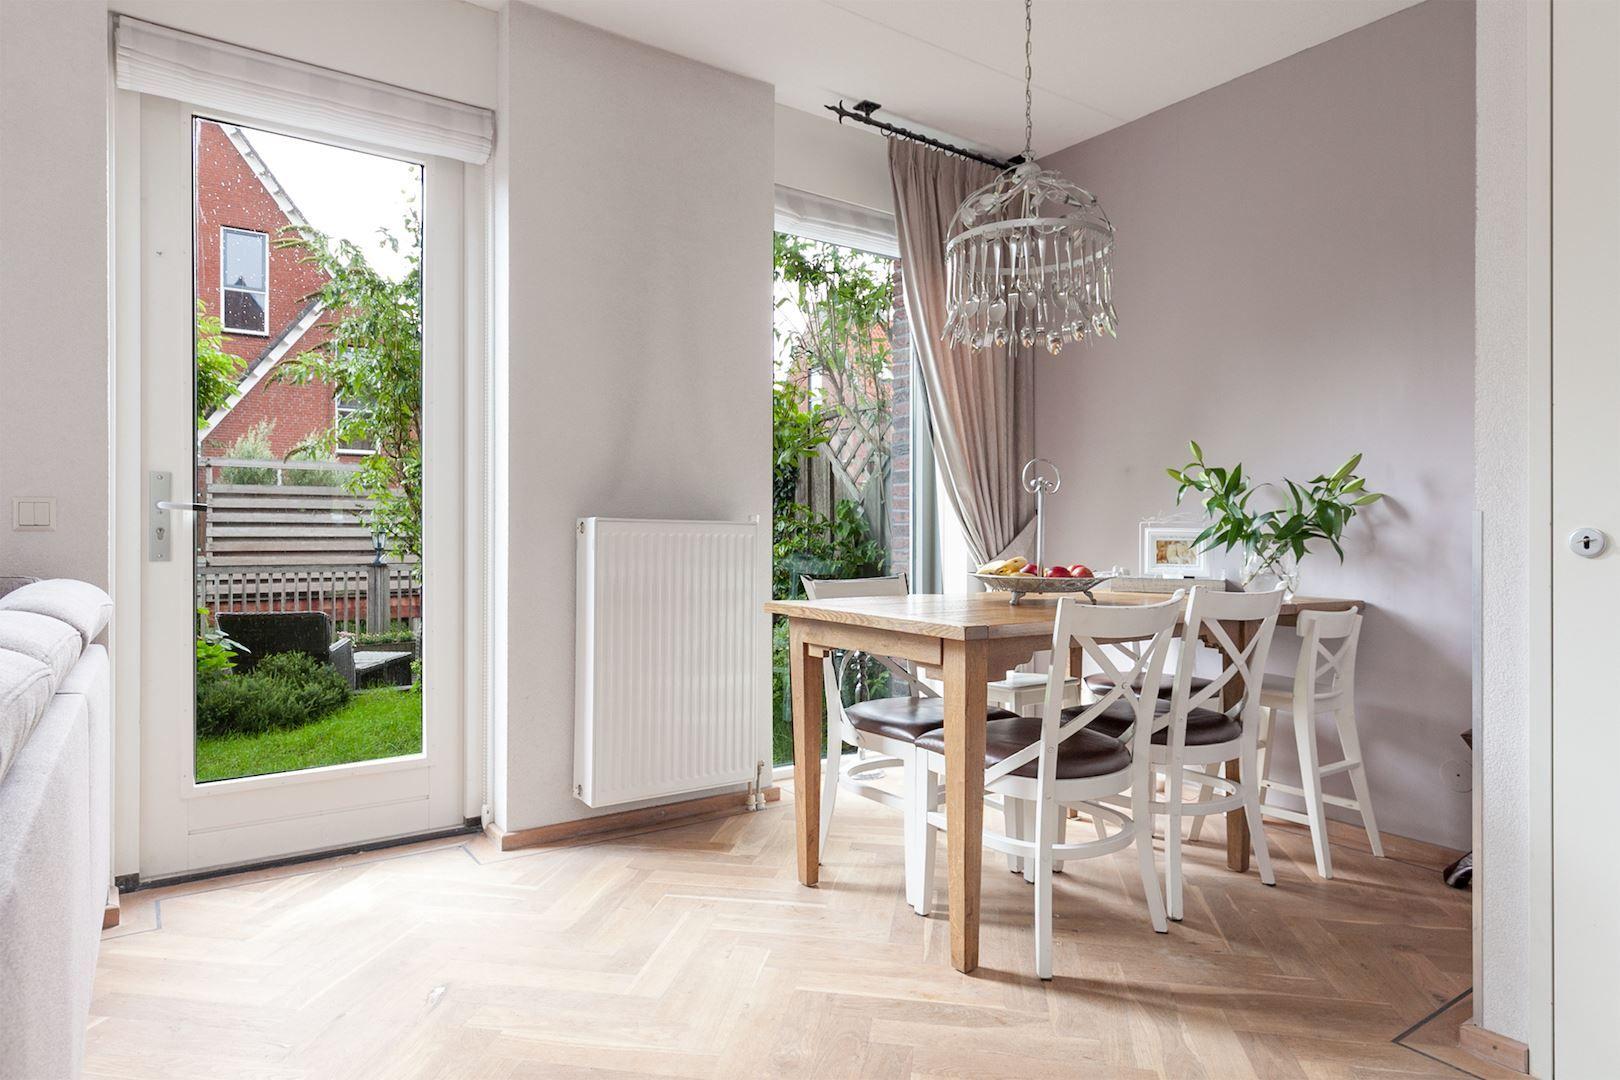 Huis Te Koop Wilde Gagel 52 2498 Ep Den Haag Funda Living